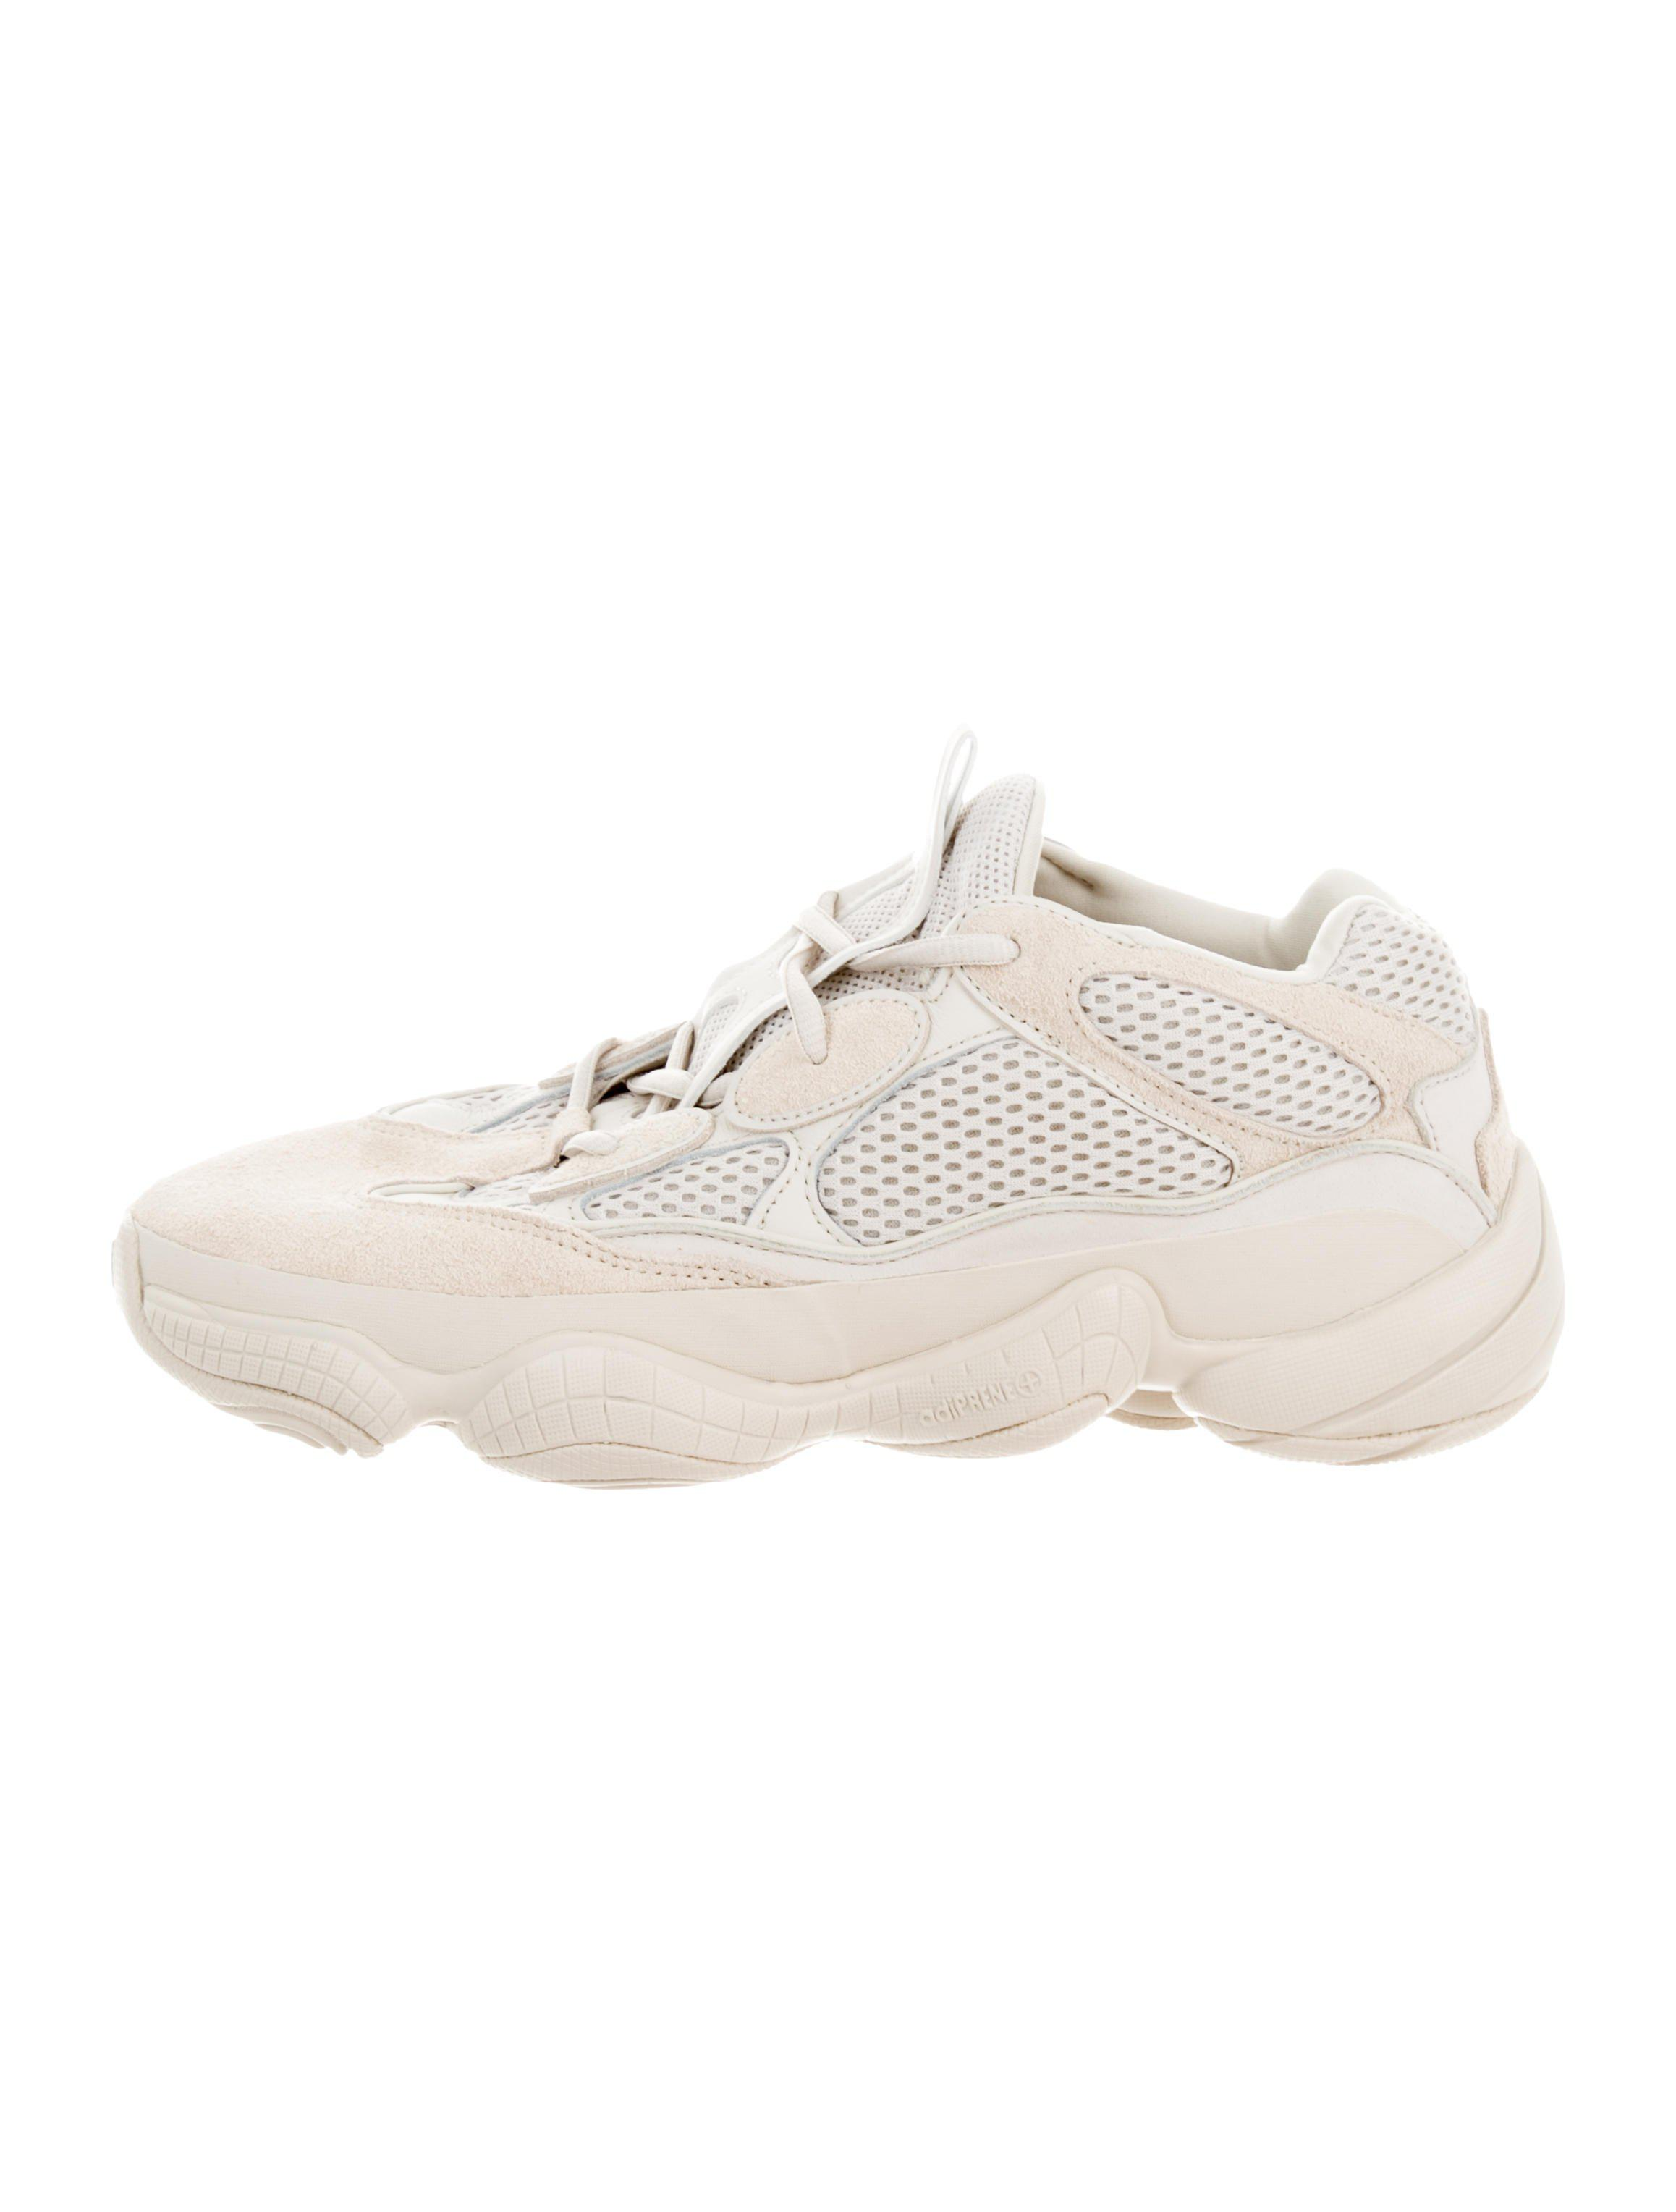 2027d0a21 Lyst - Yeezy 2018 Blush Desert Rat 500 Sneakers W  Tags Neutrals in ...